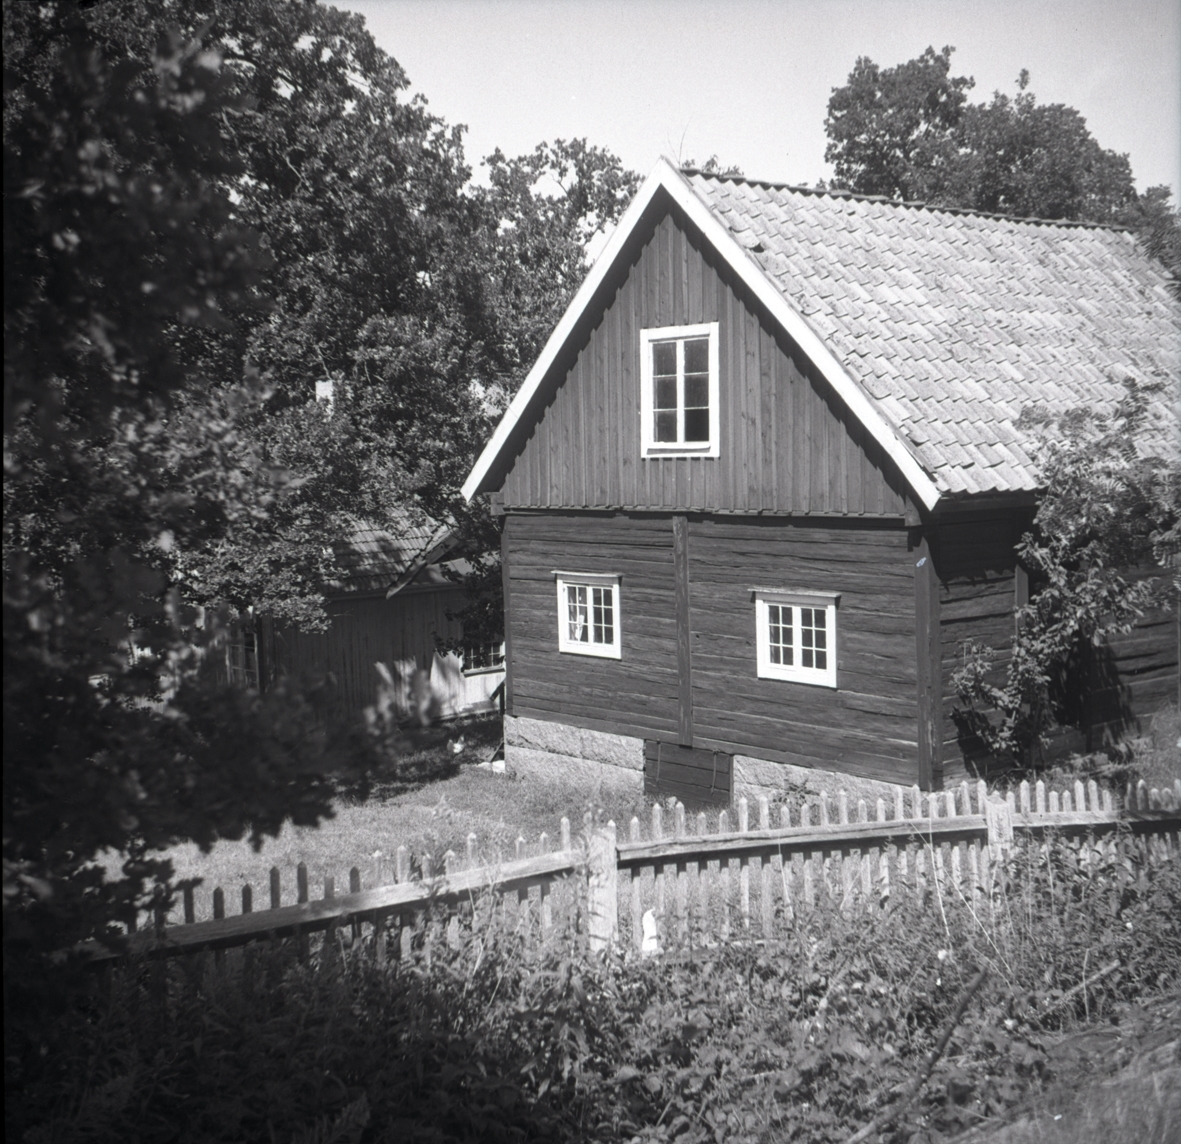 Misterhult Church Graveyard in Oskarshamn, Kalmar ln